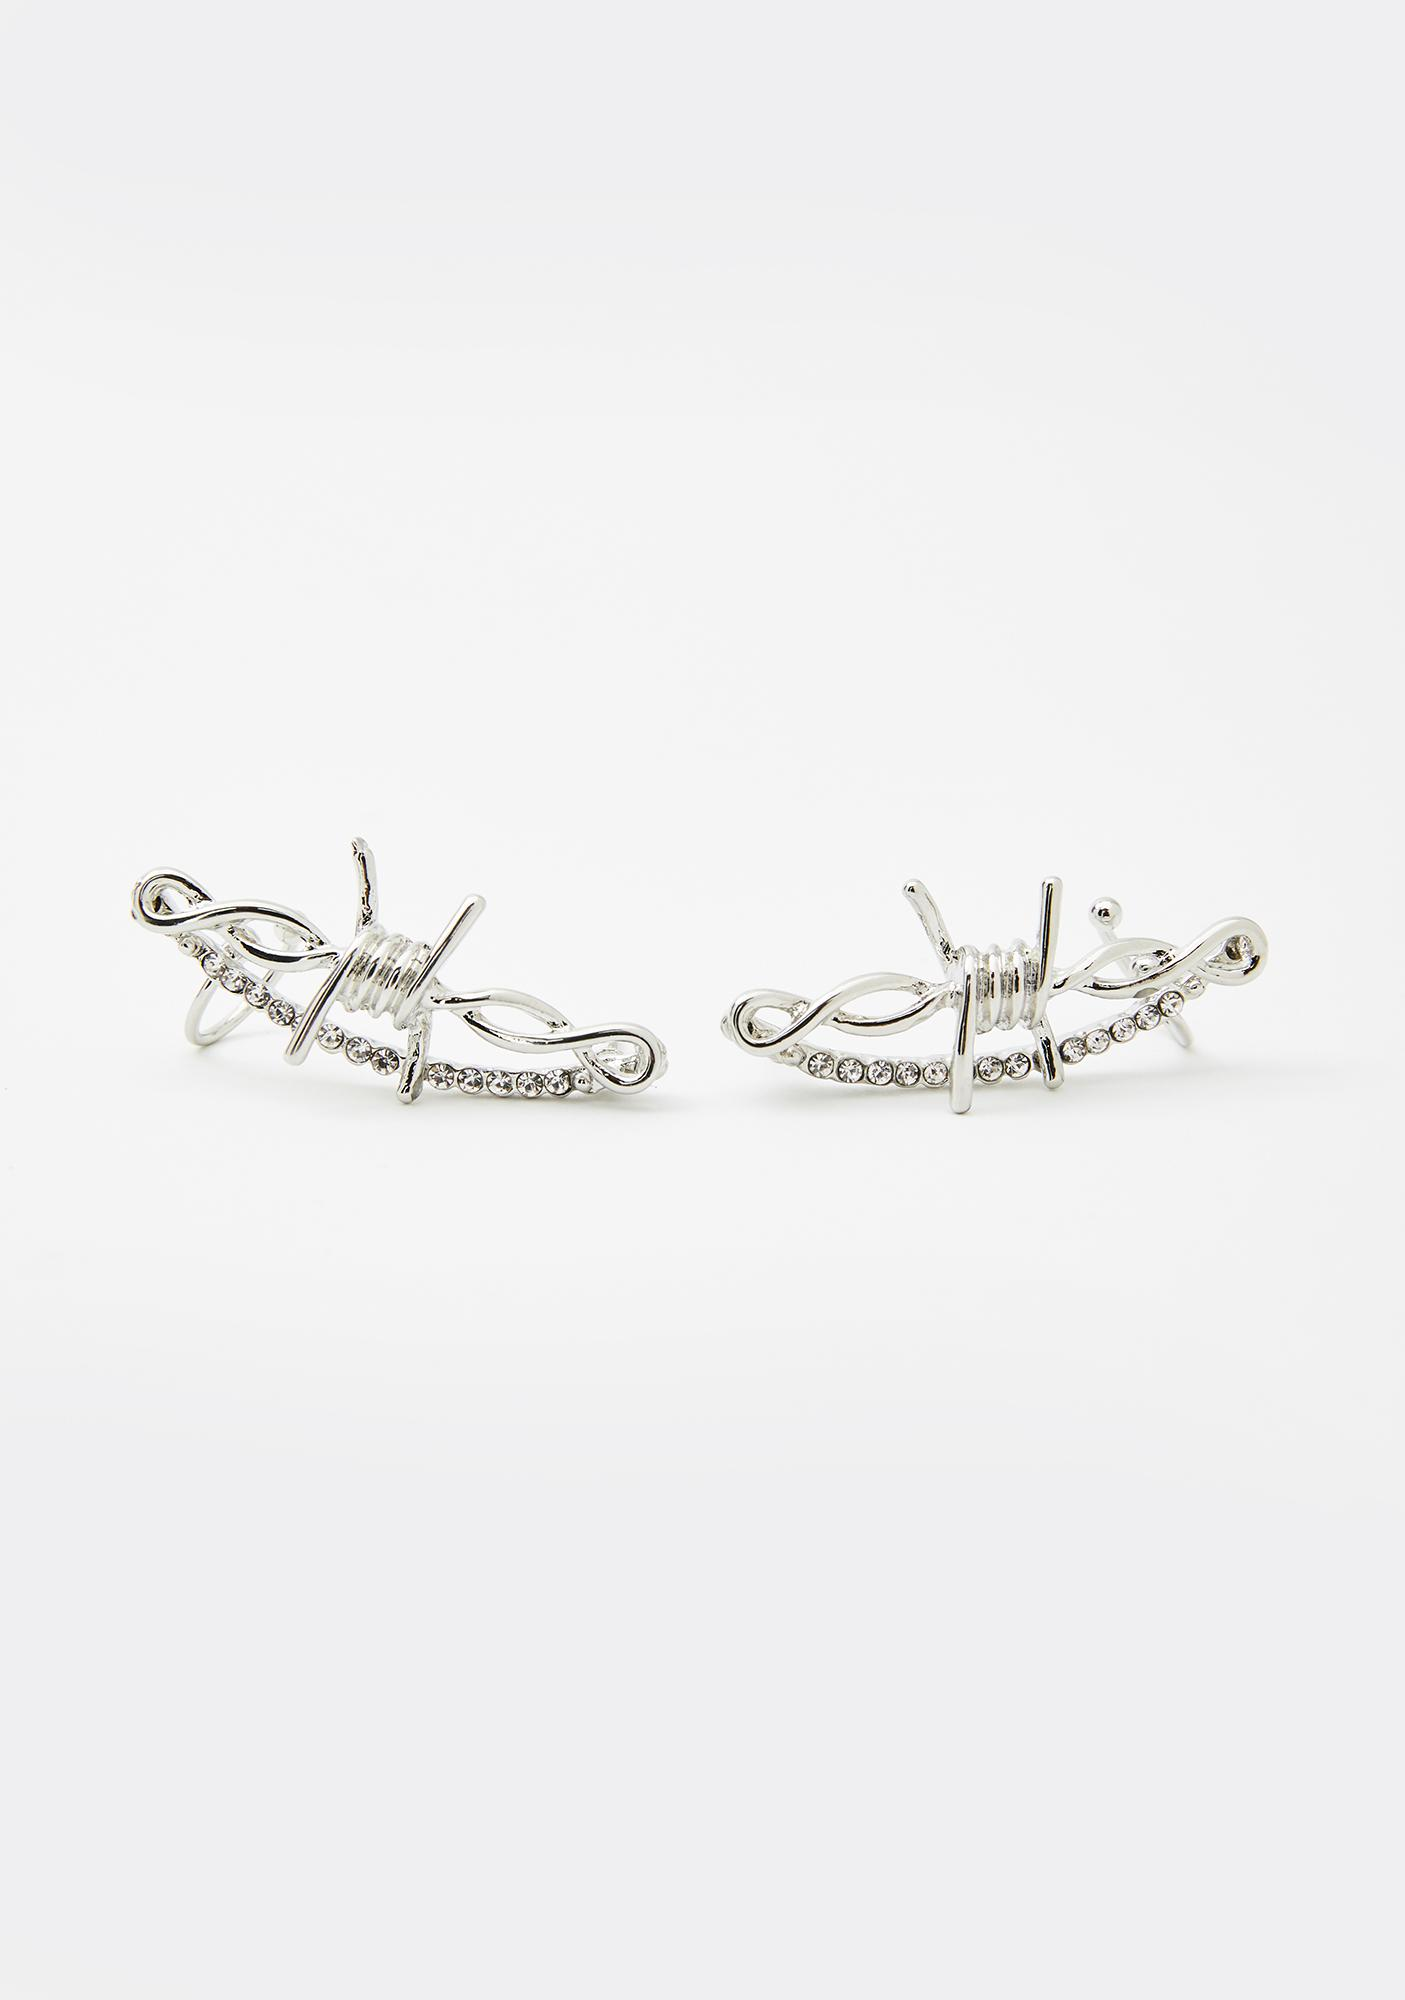 Caged Rage Barbed Wire Ear Cuffs